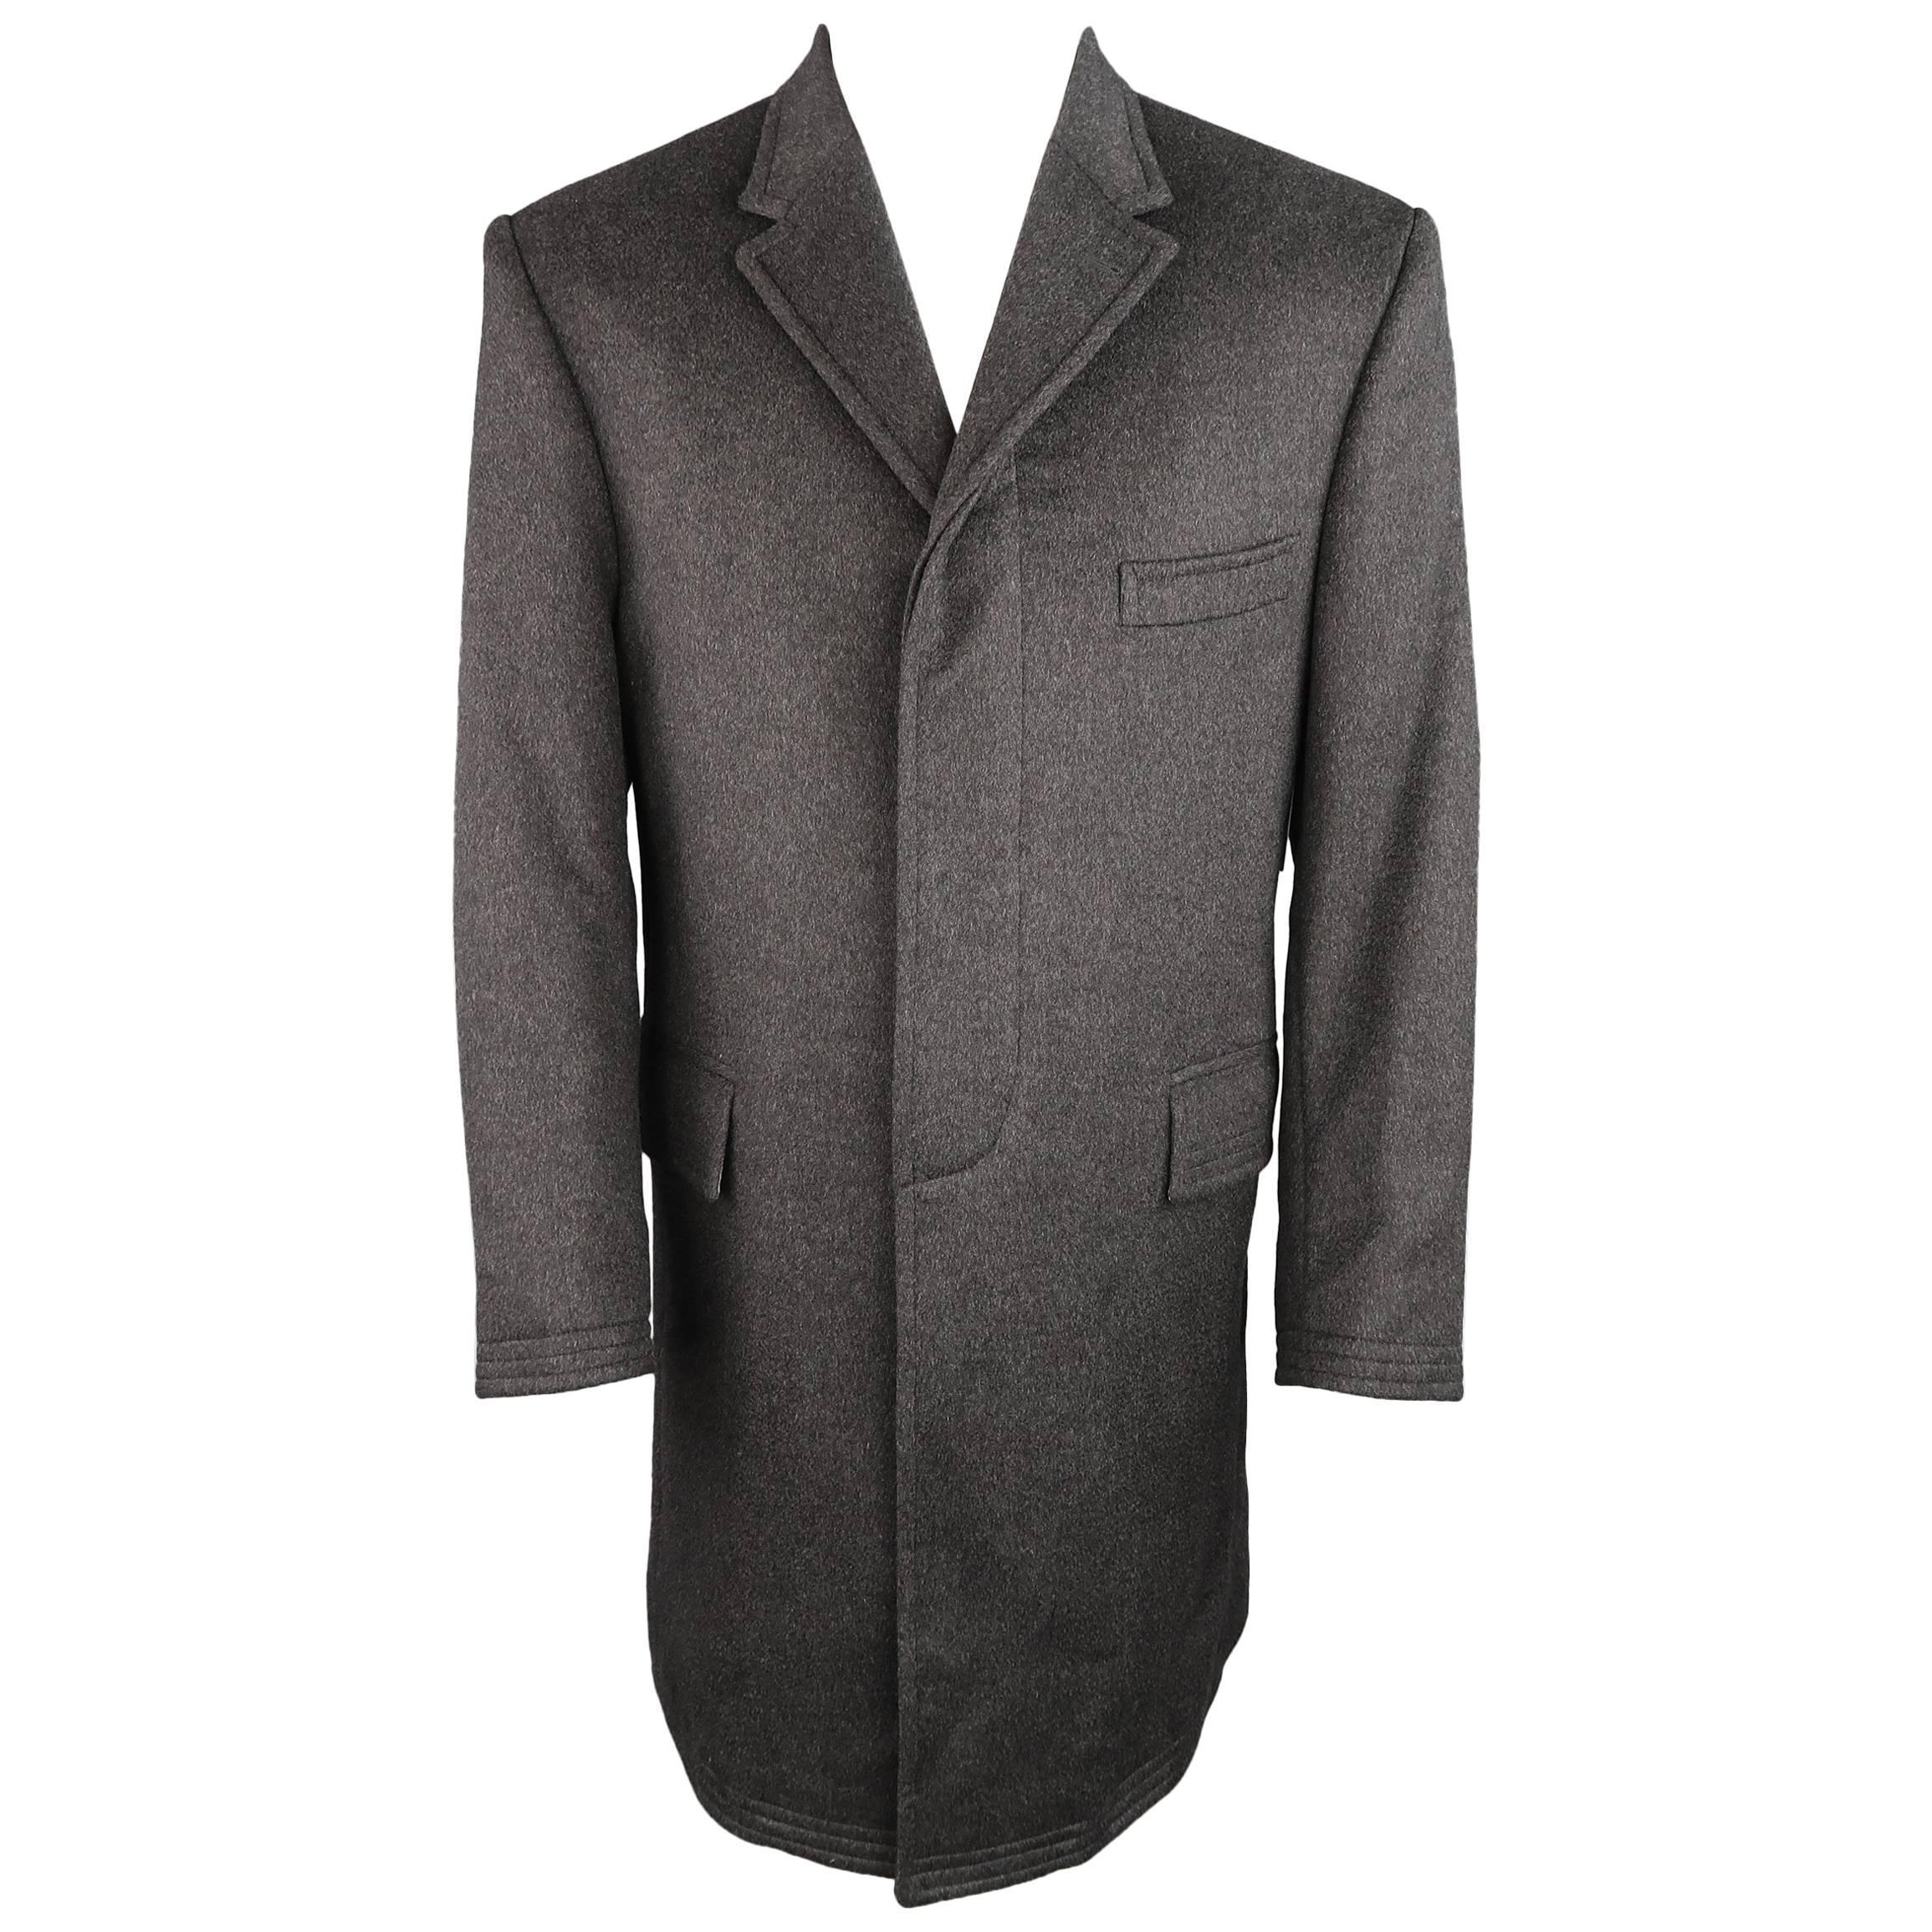 87c1e65180 THOM BROWNE Coat - 40 Charcoal Cashmere Hidden Placket Notch Lapel Jacket  at 1stdibs